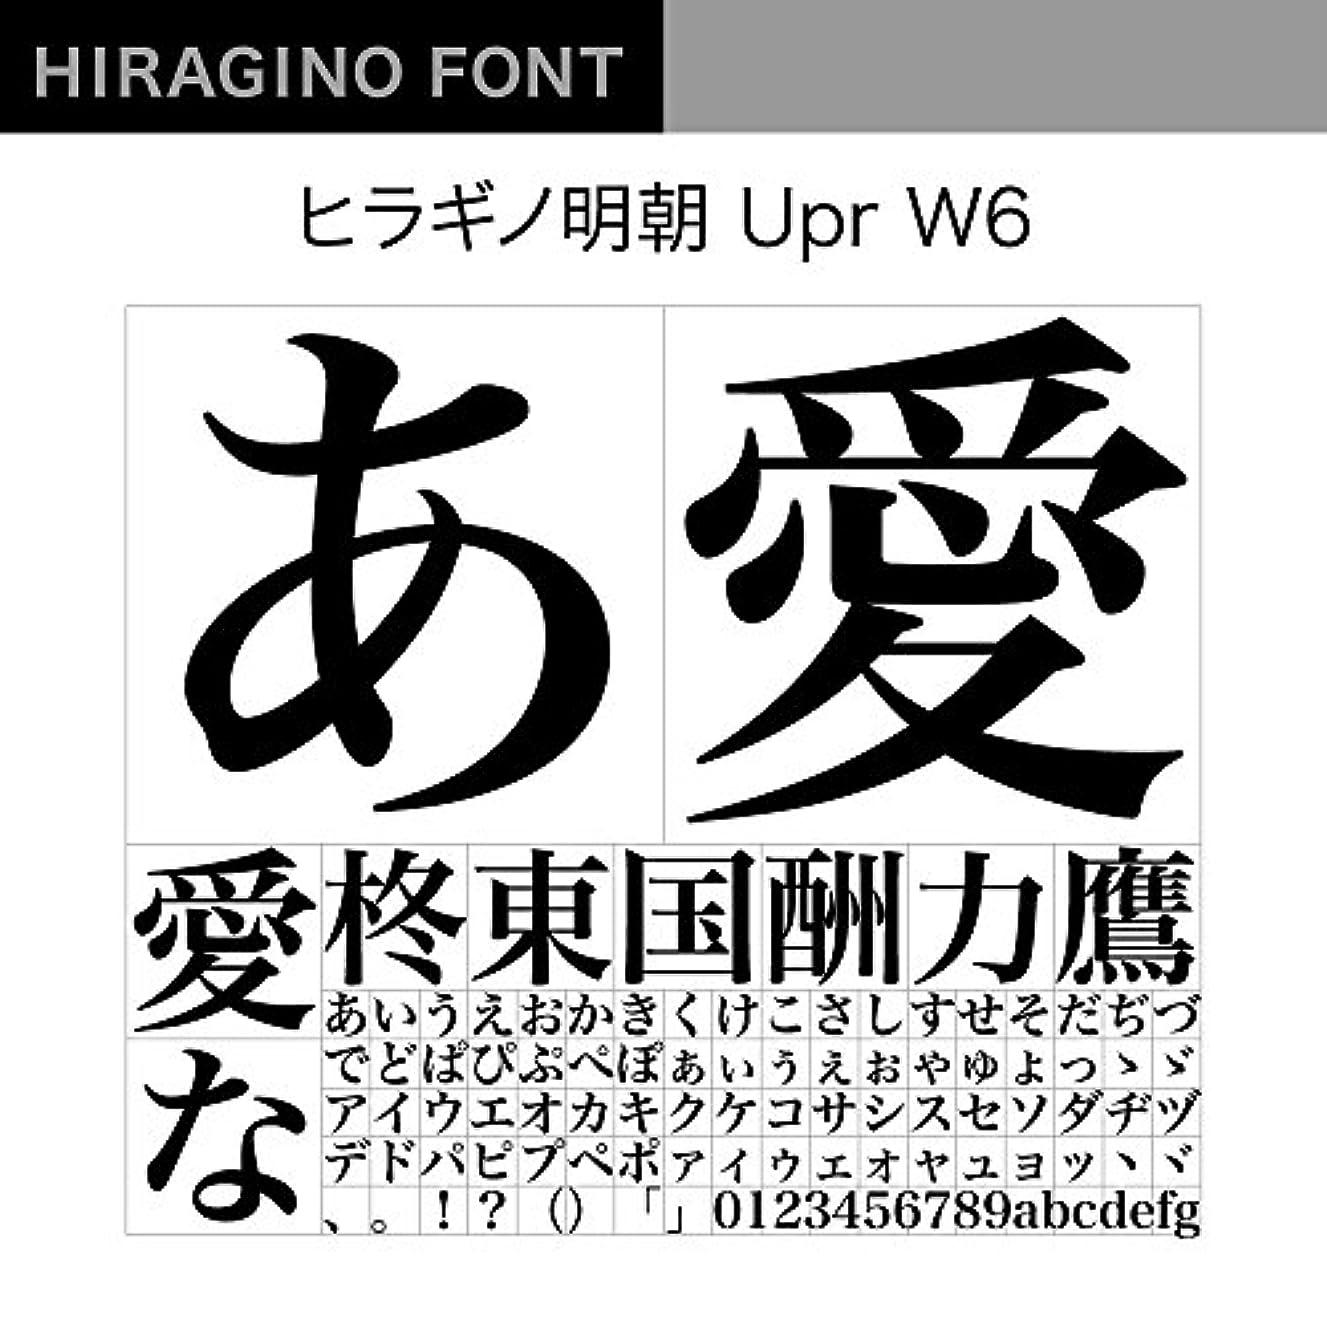 OpenType ヒラギノ明朝 Upr W6 [ダウンロード]